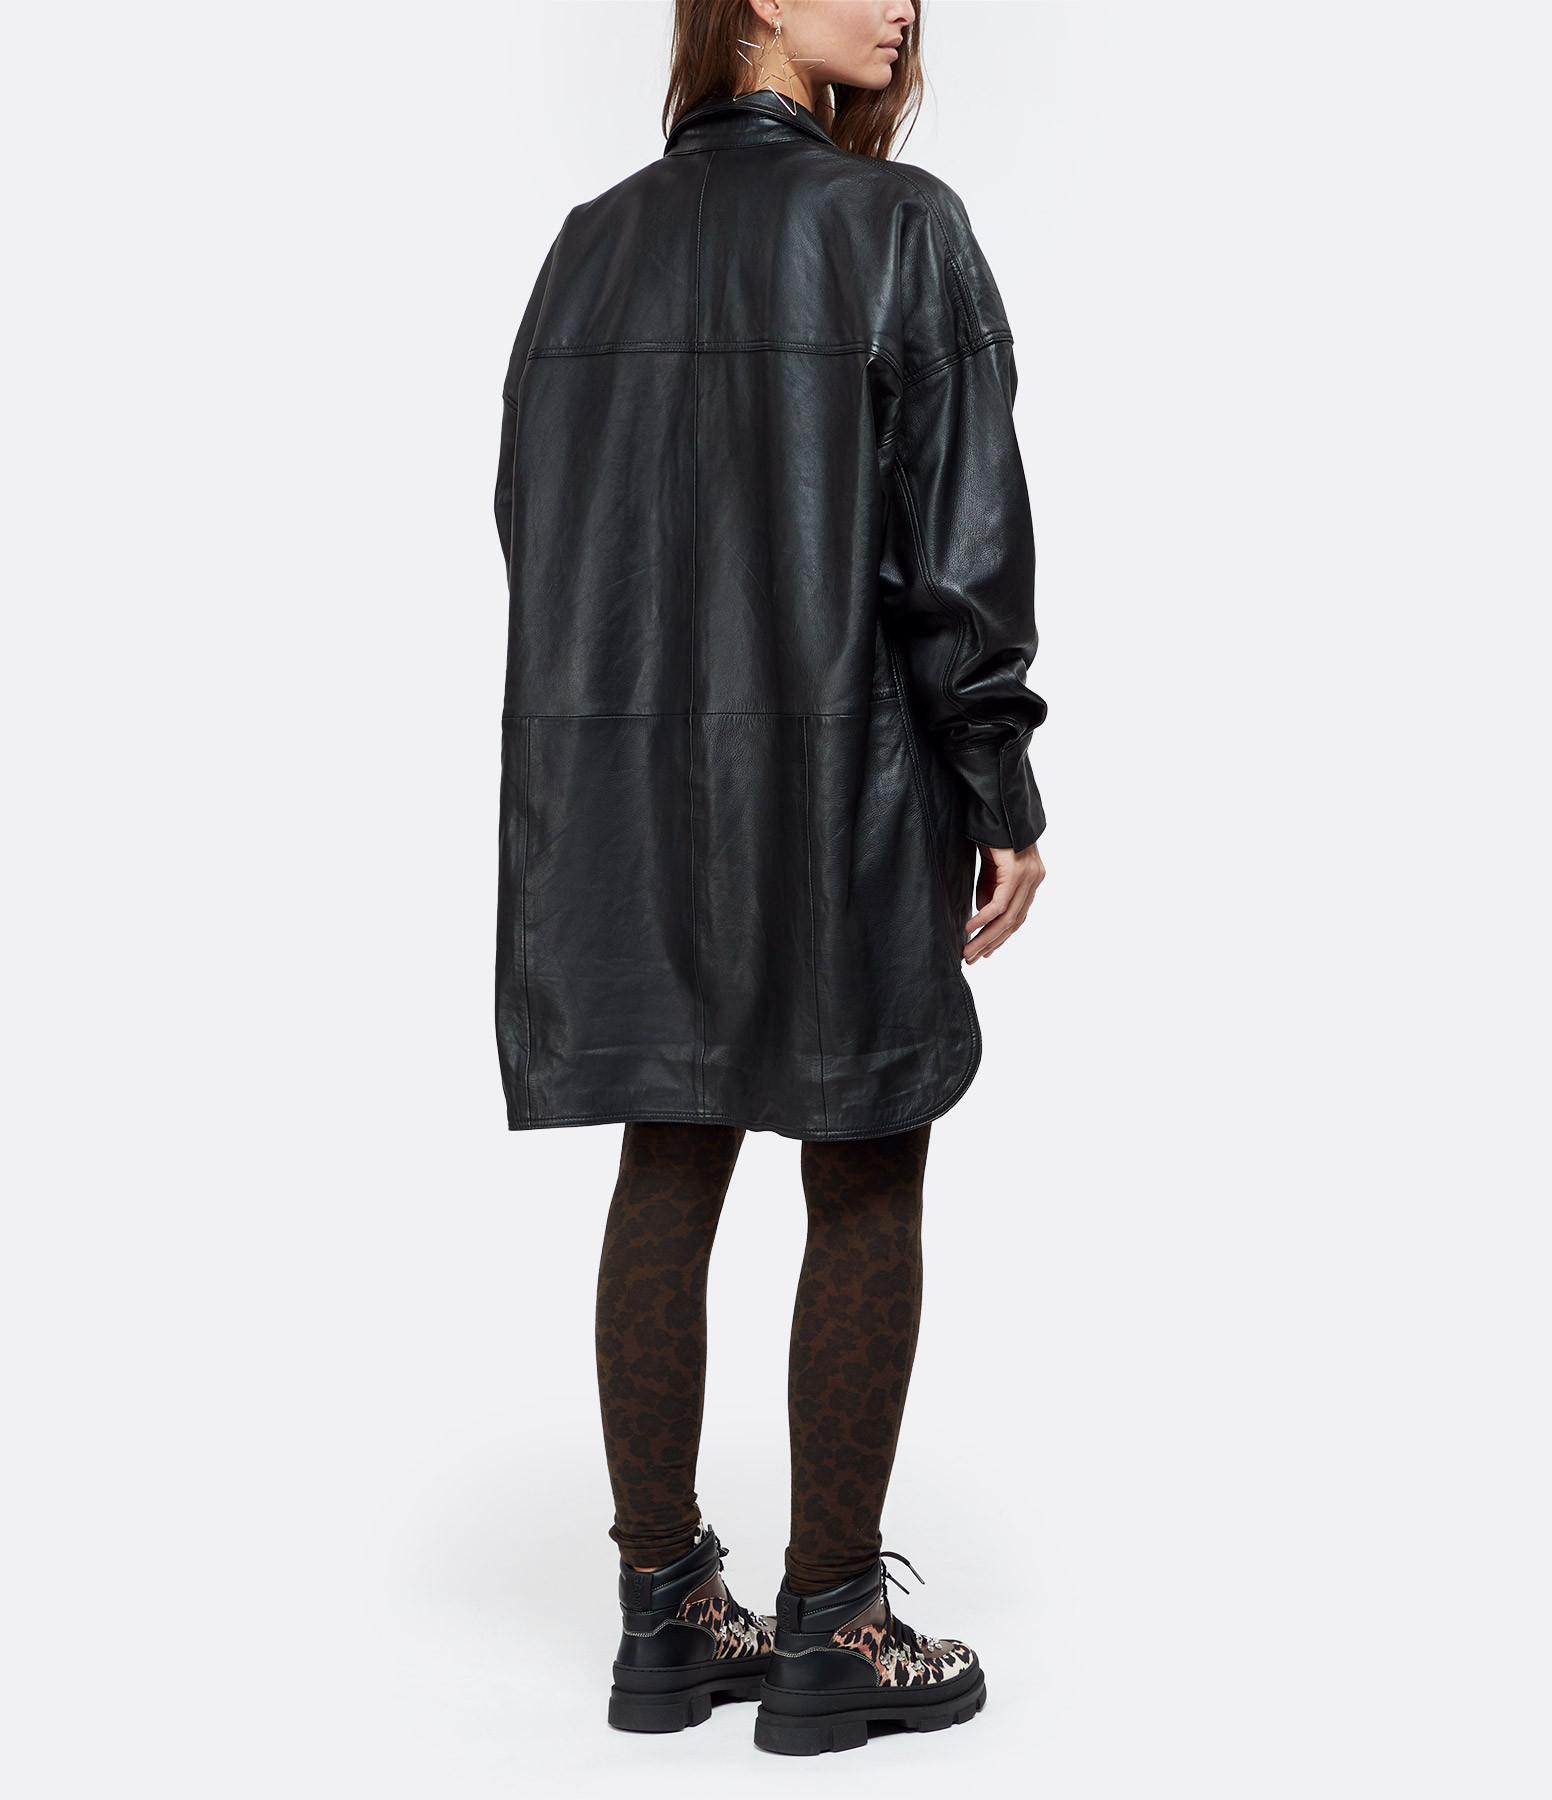 RAIINE - Surchemise Macon Noir